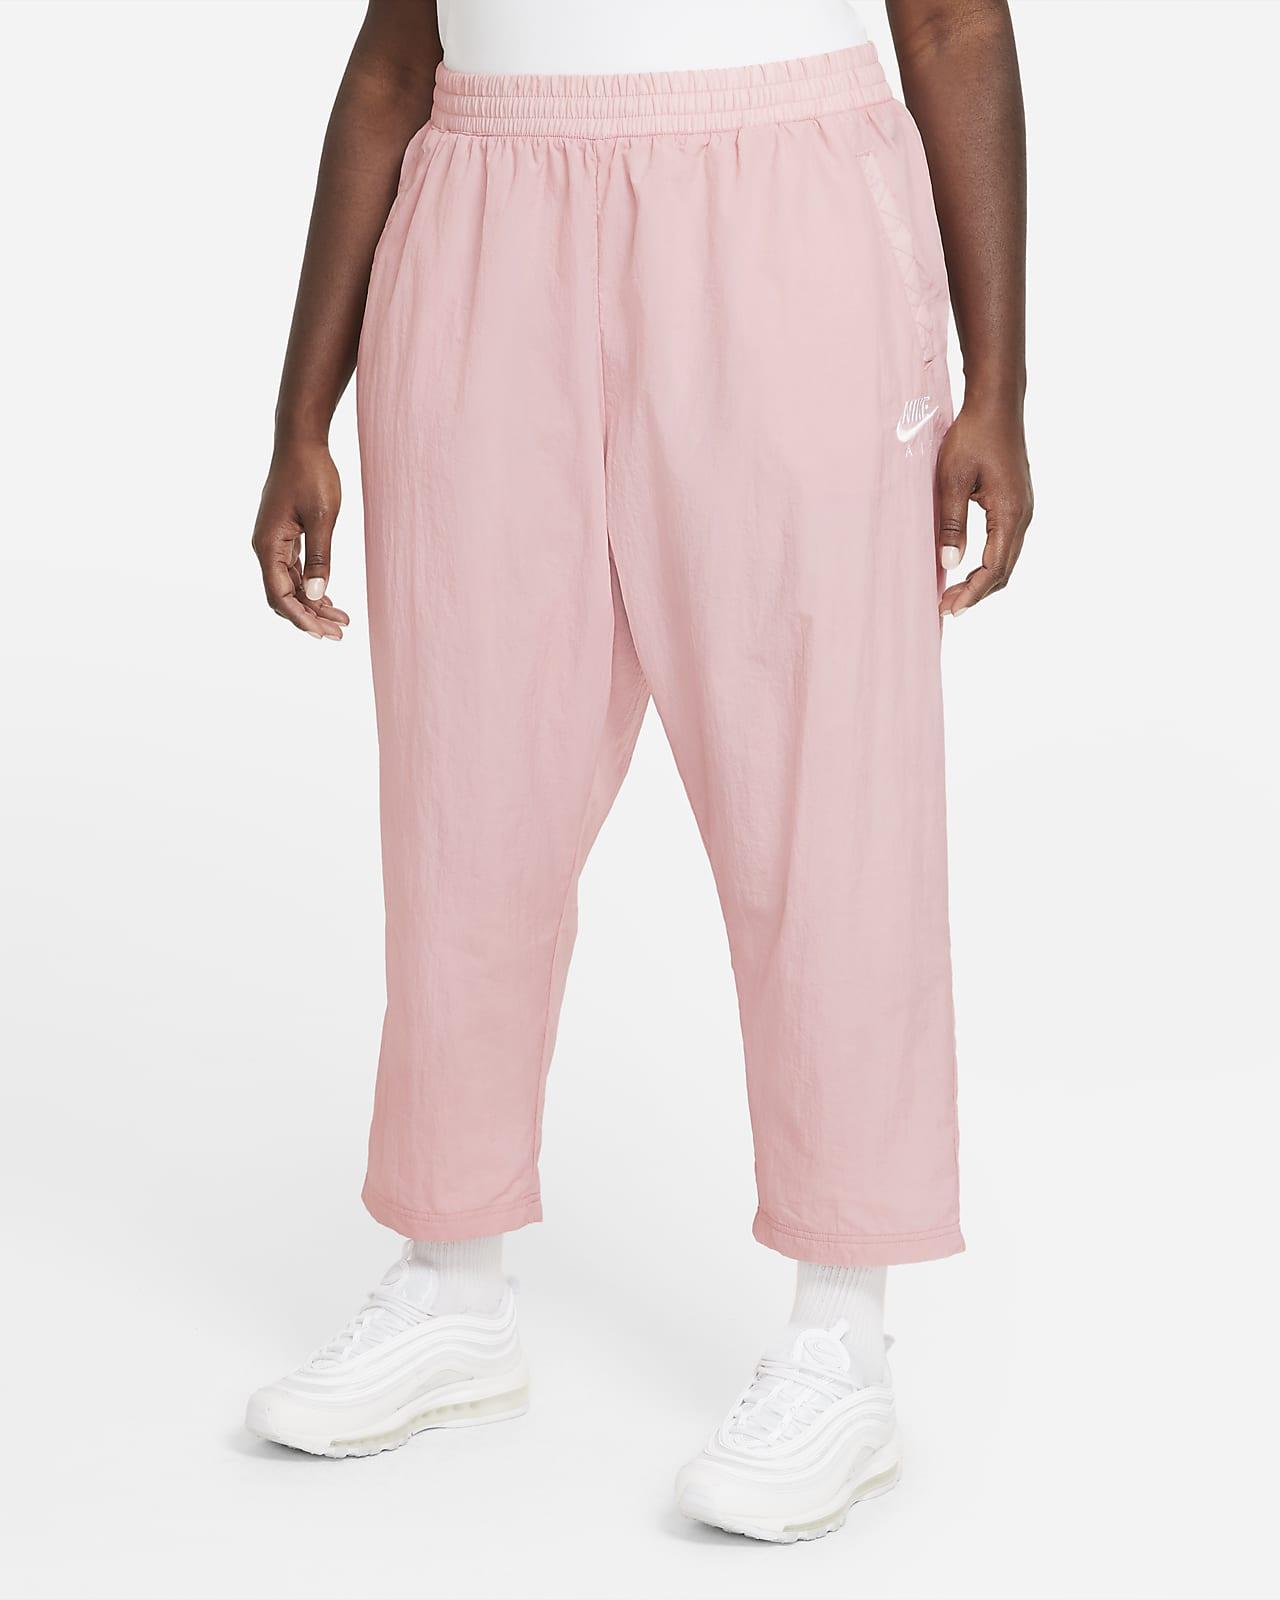 Nike Air Women's Woven Trousers (Plus Size)